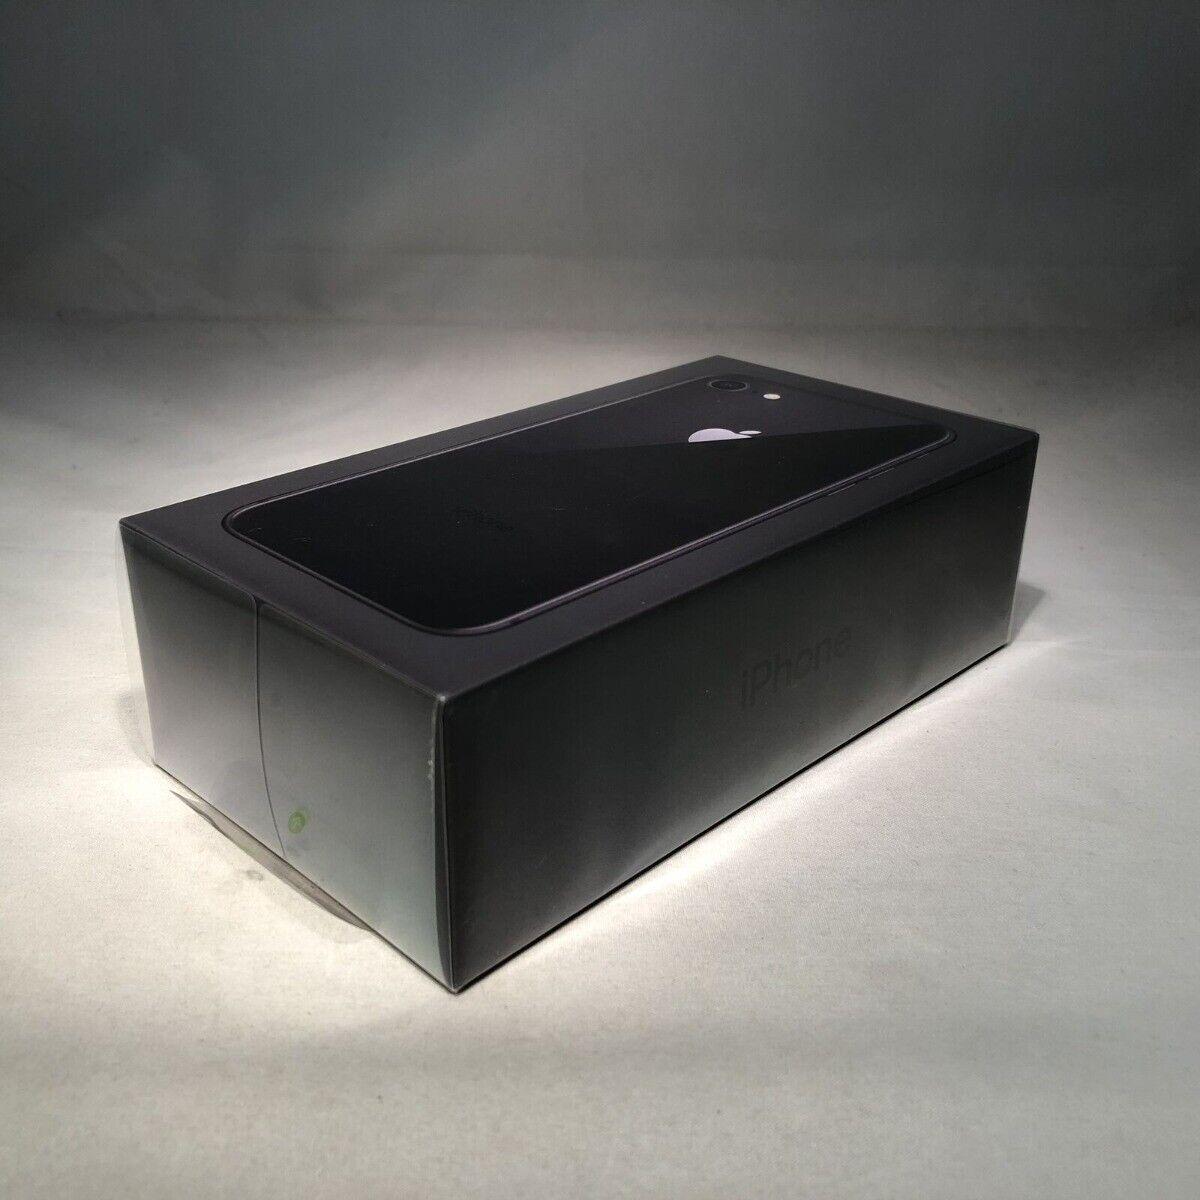 Apple iPhone 8 - 64GB - Space Gray (Factory Unlocked) A1863 (CDMA + GSM)